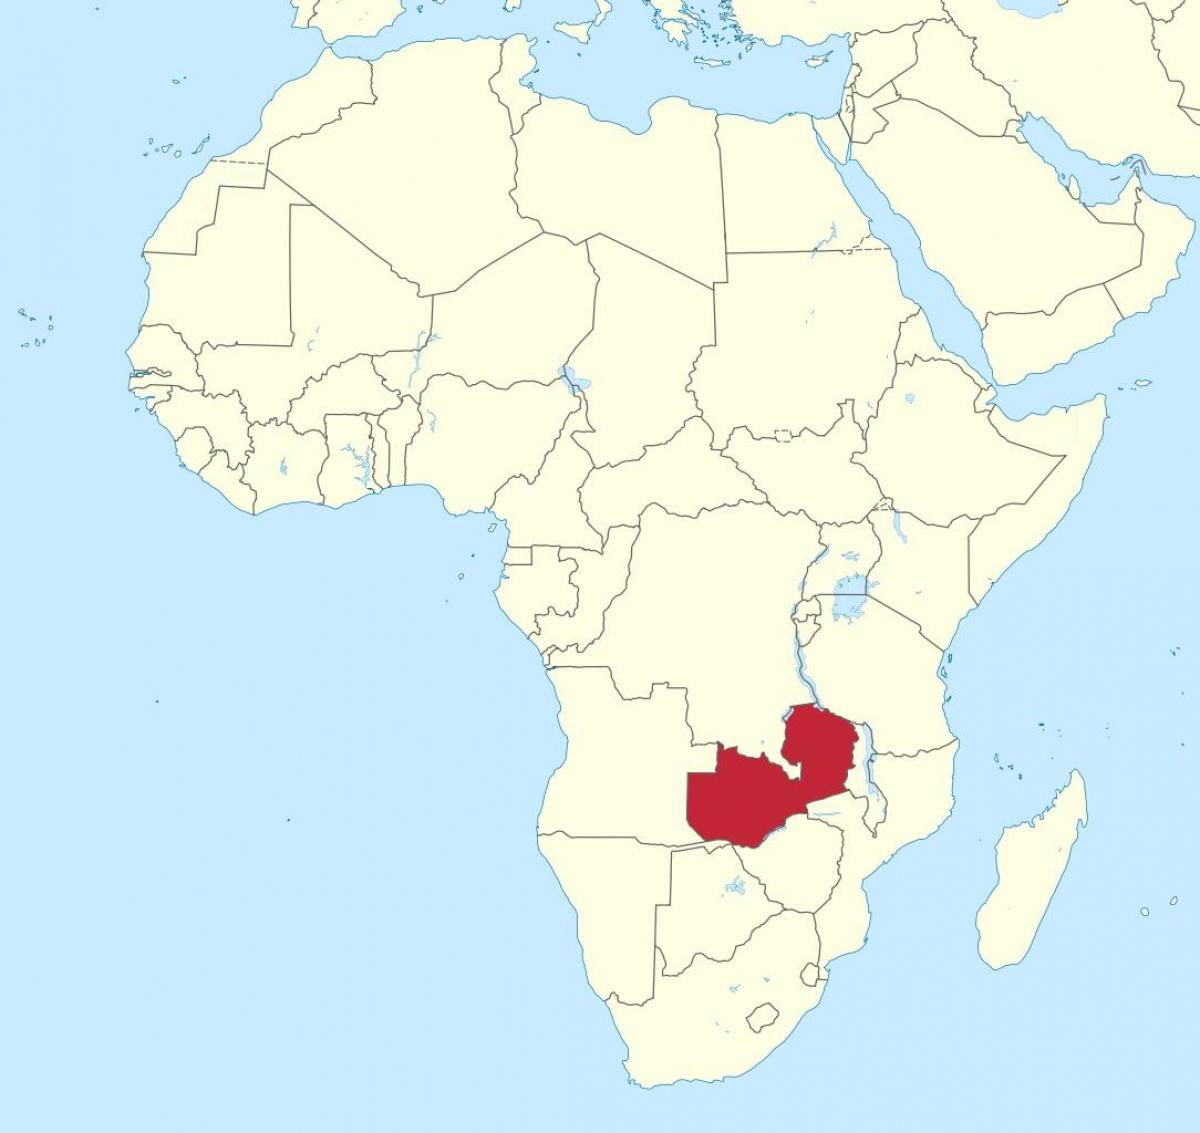 Cartina Dell Africa Orientale.Zambia Africa Mappa Mappa Dell Africa Mostrando Zambia